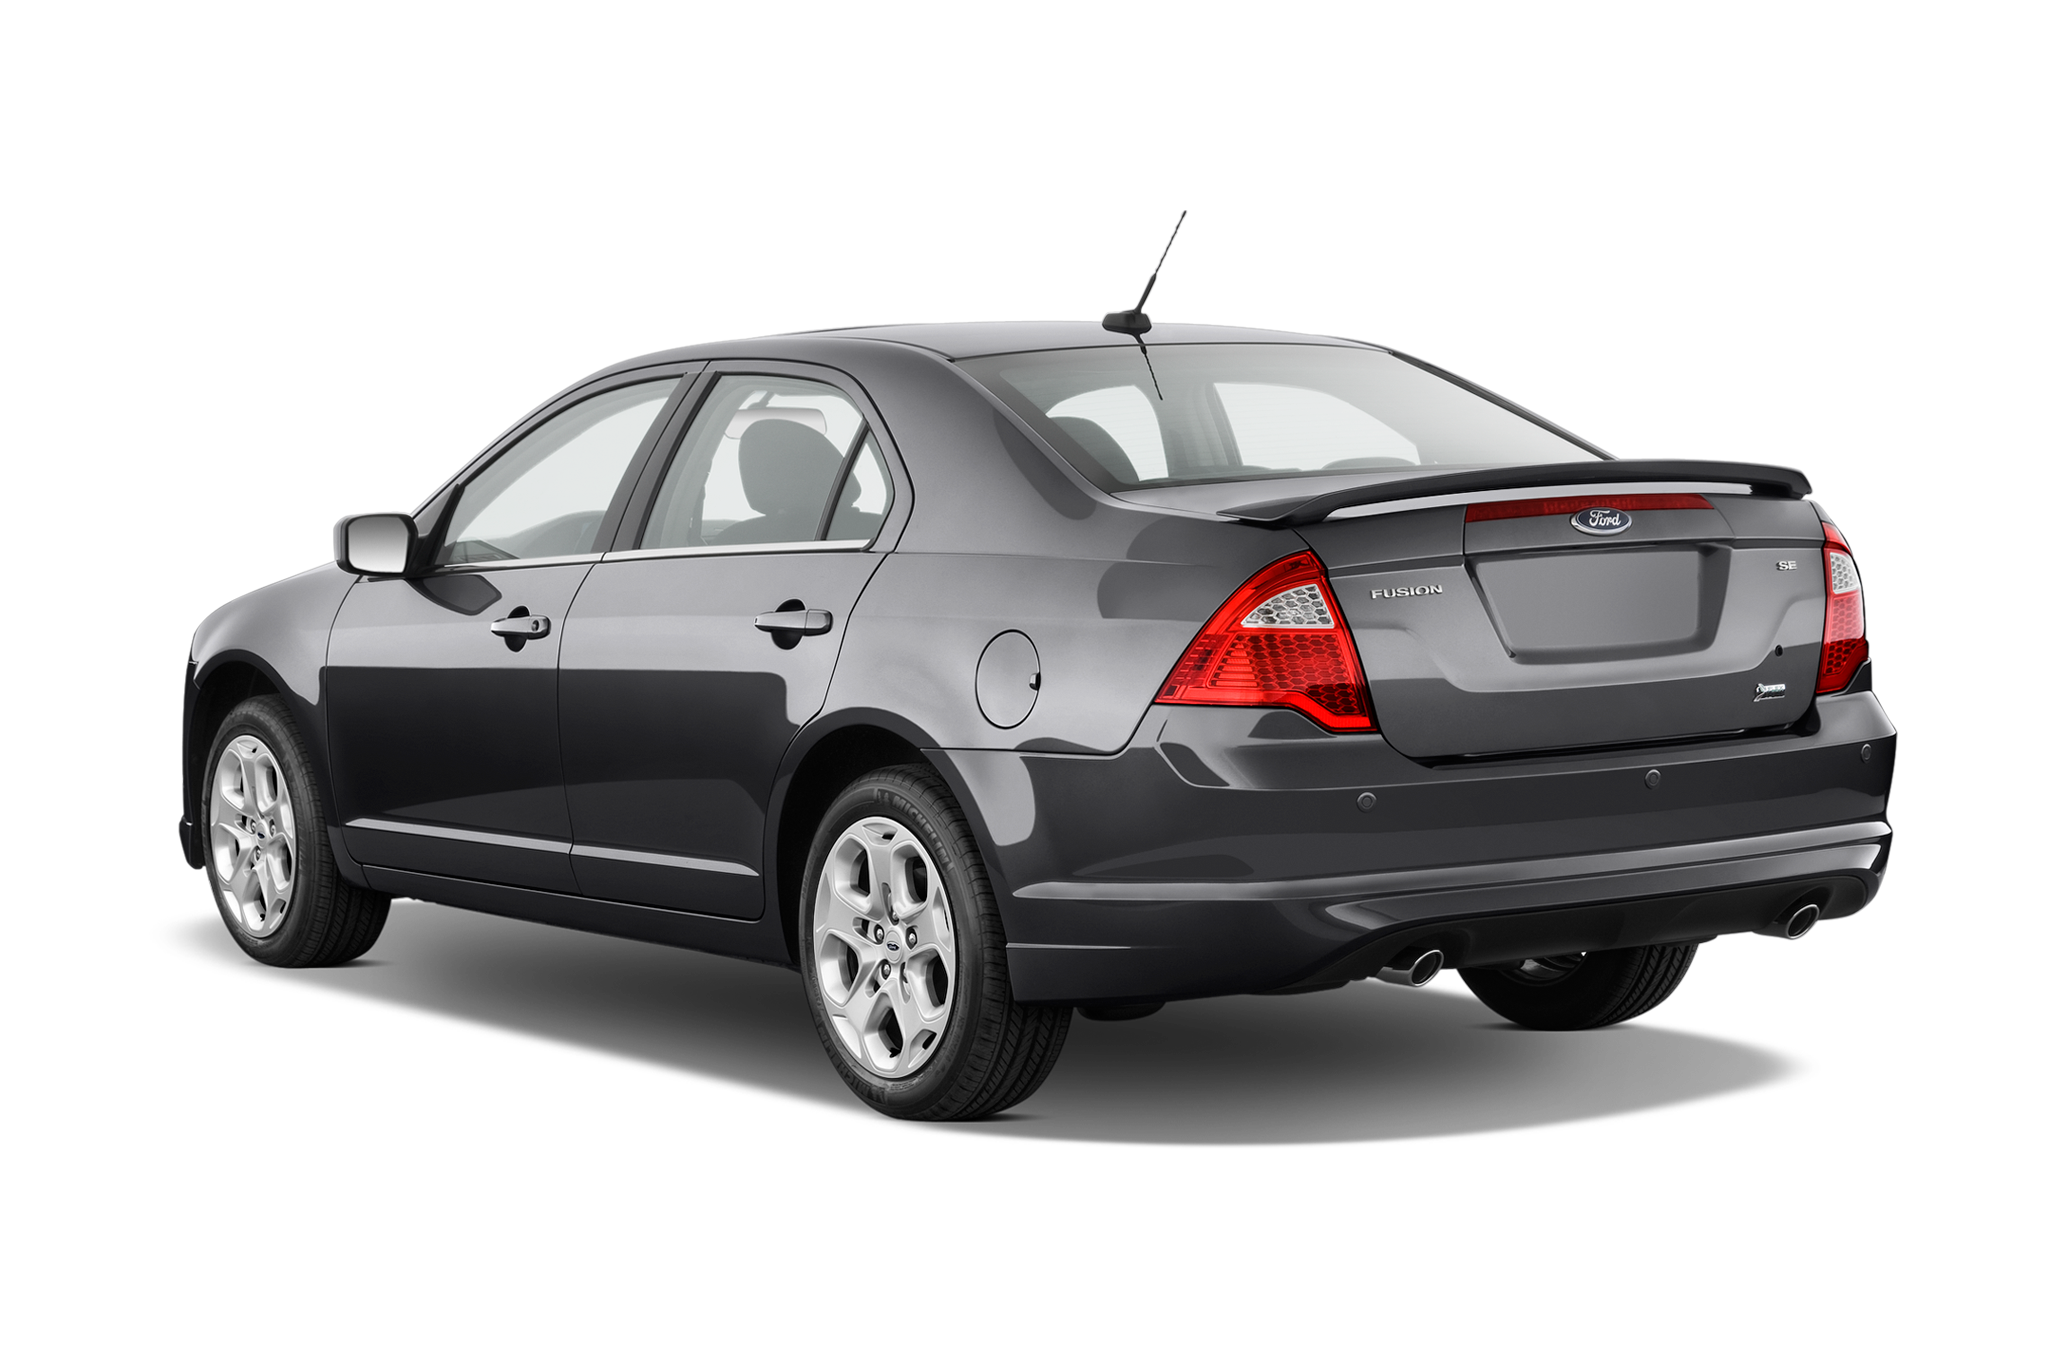 Ford Fusion (North America) I 2005 - 2012 Sedan #4